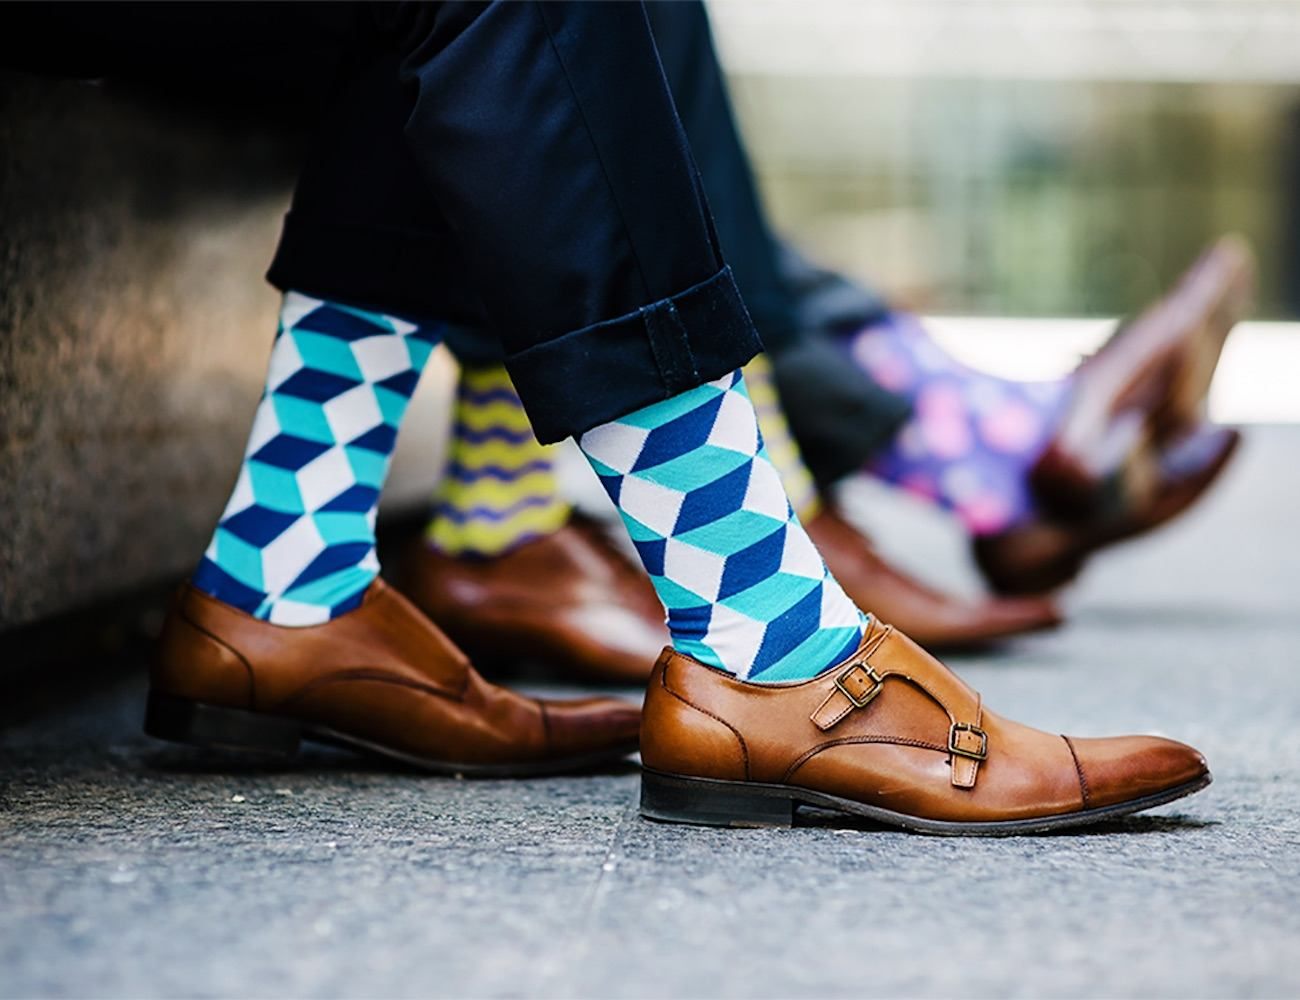 Flyte Socks – Ridiculously Bright, Bold & Comfortable Socks